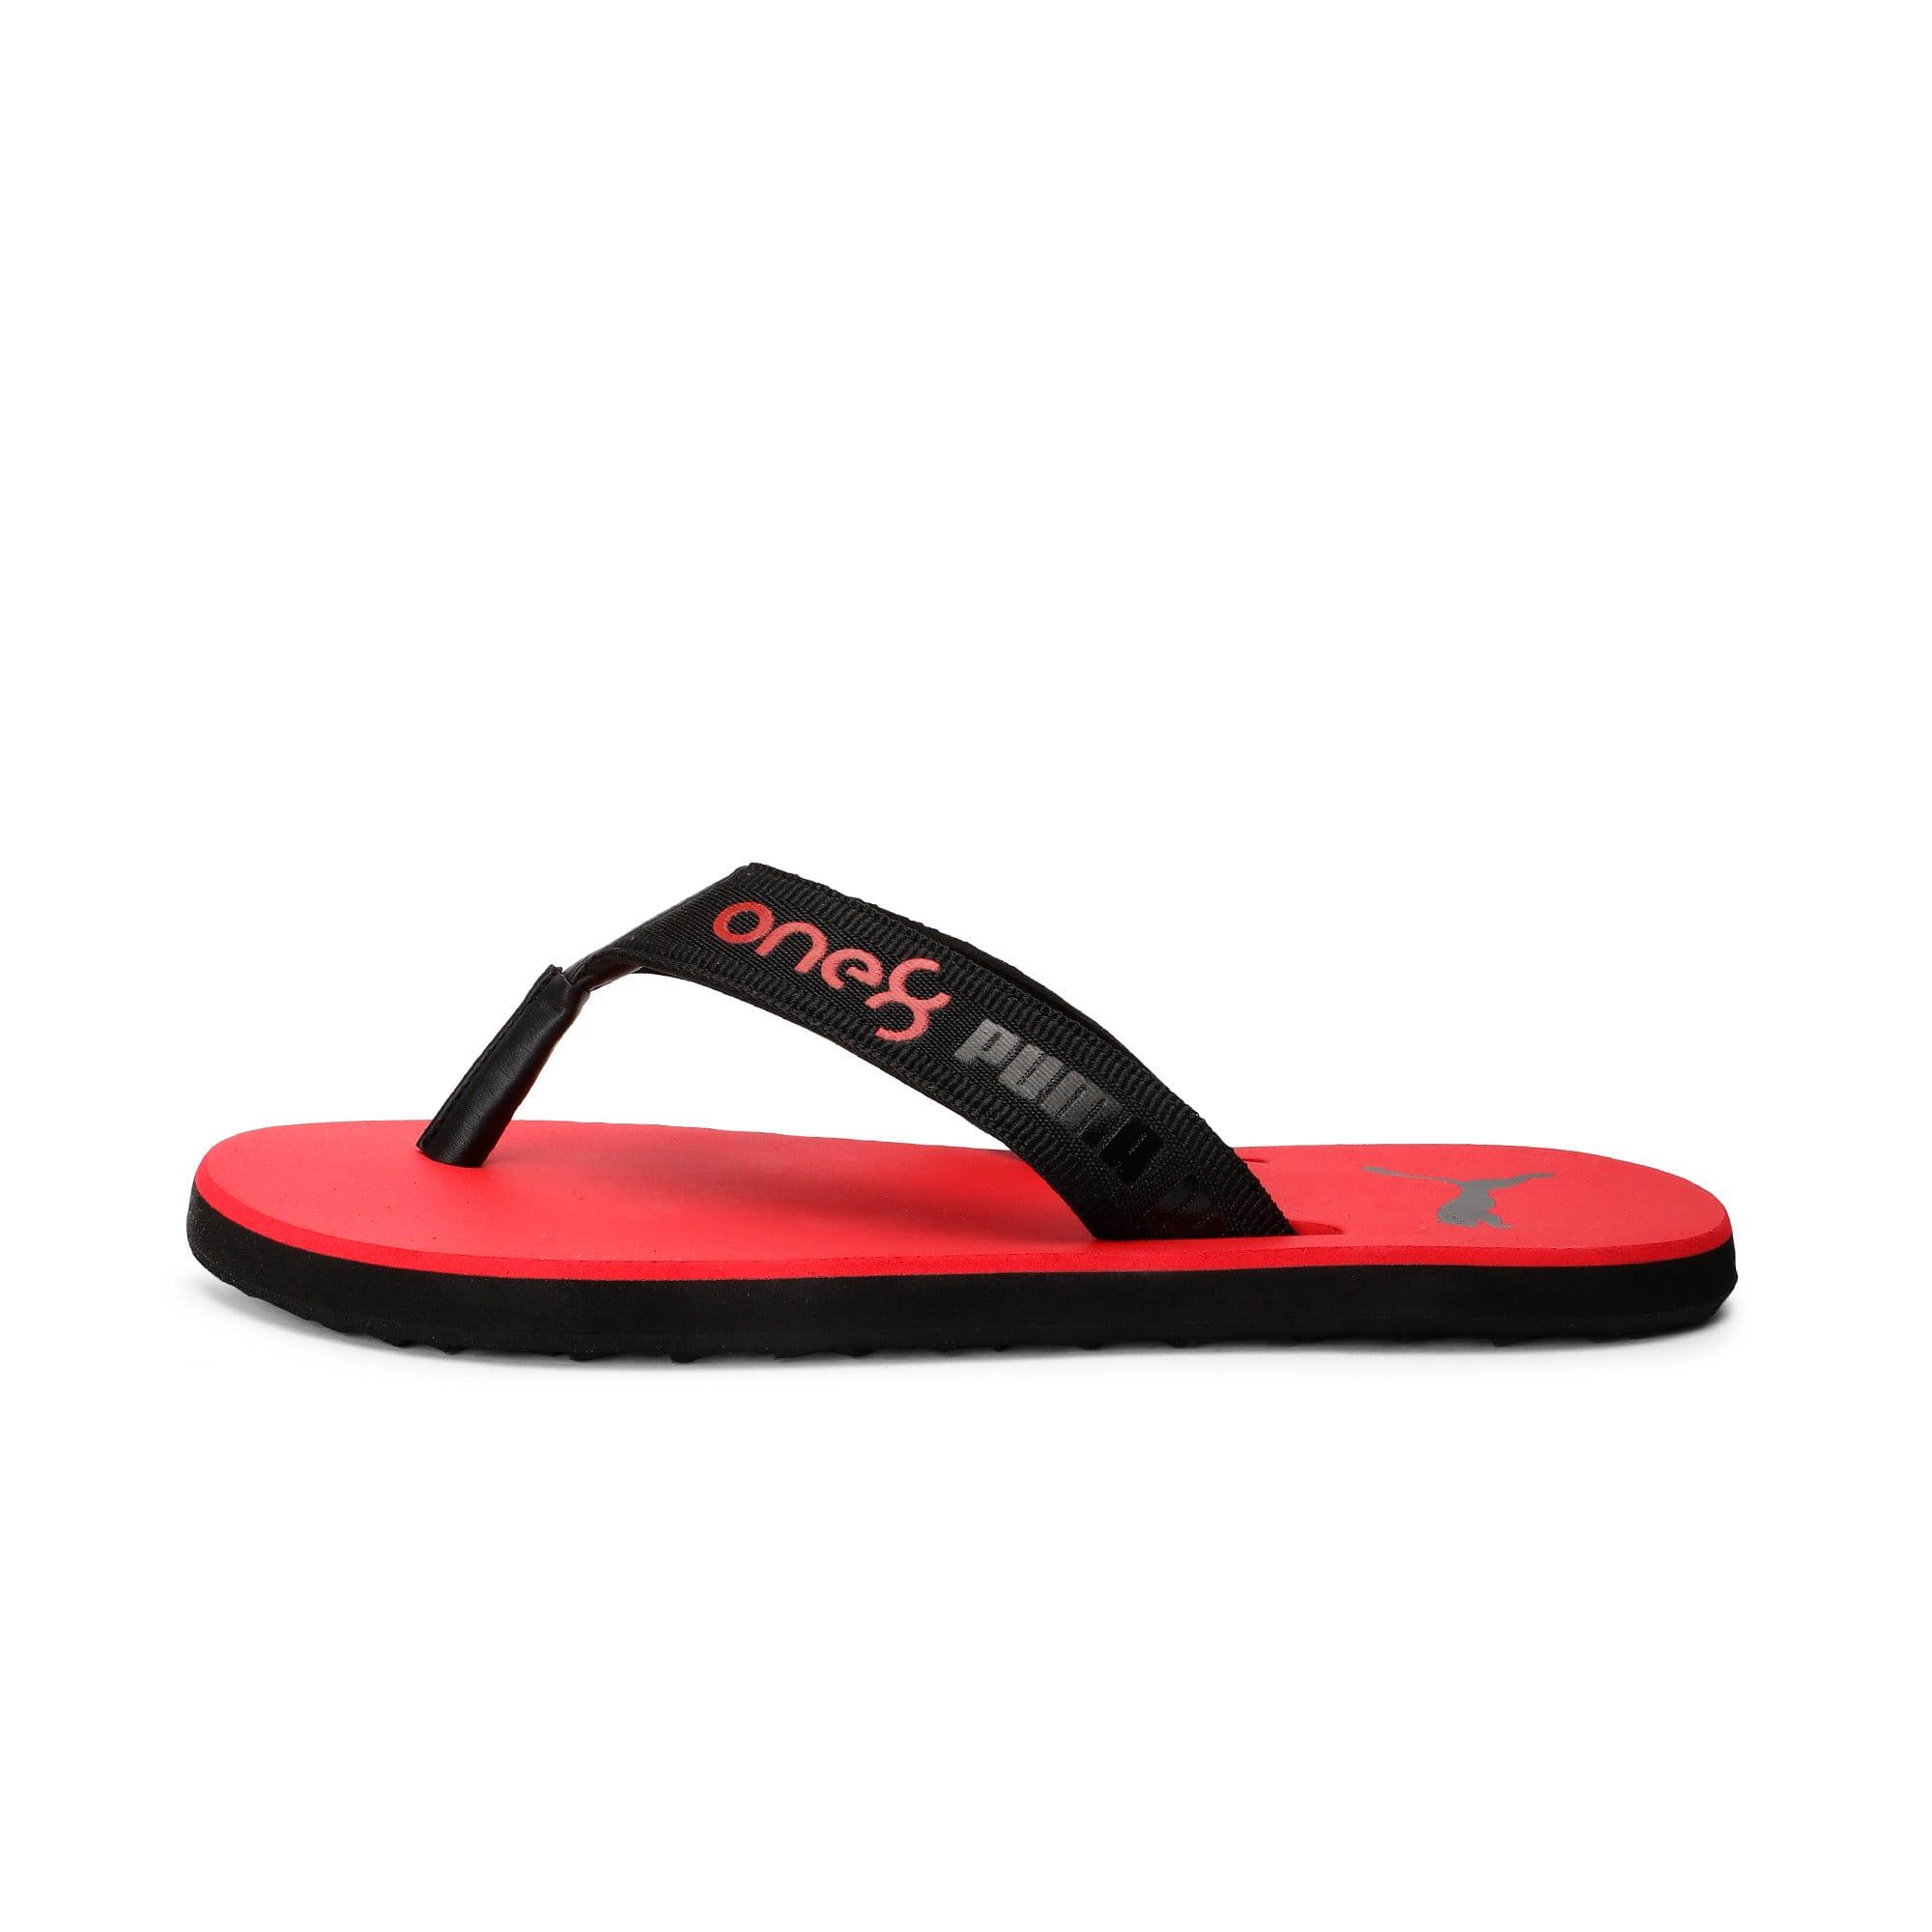 Thumbnail 1 of Breeze one8 GU Men's Sandals, High Risk Red-Puma Black, medium-IND